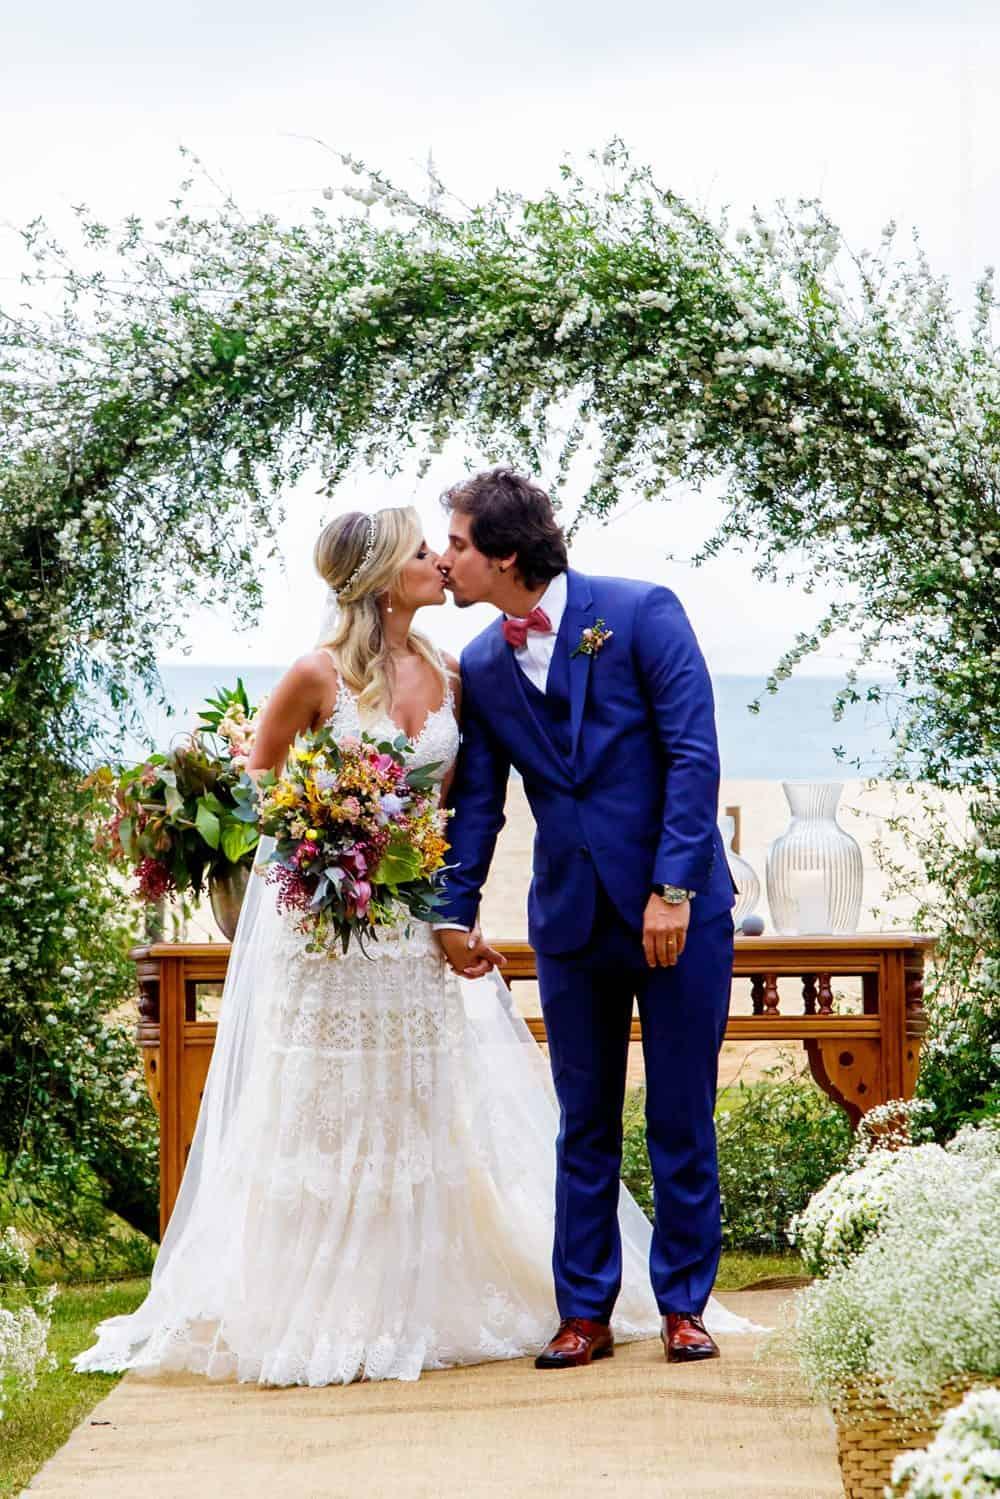 Casamento-Muriel-e-George-caseme-foto-leonardo-rezende-22